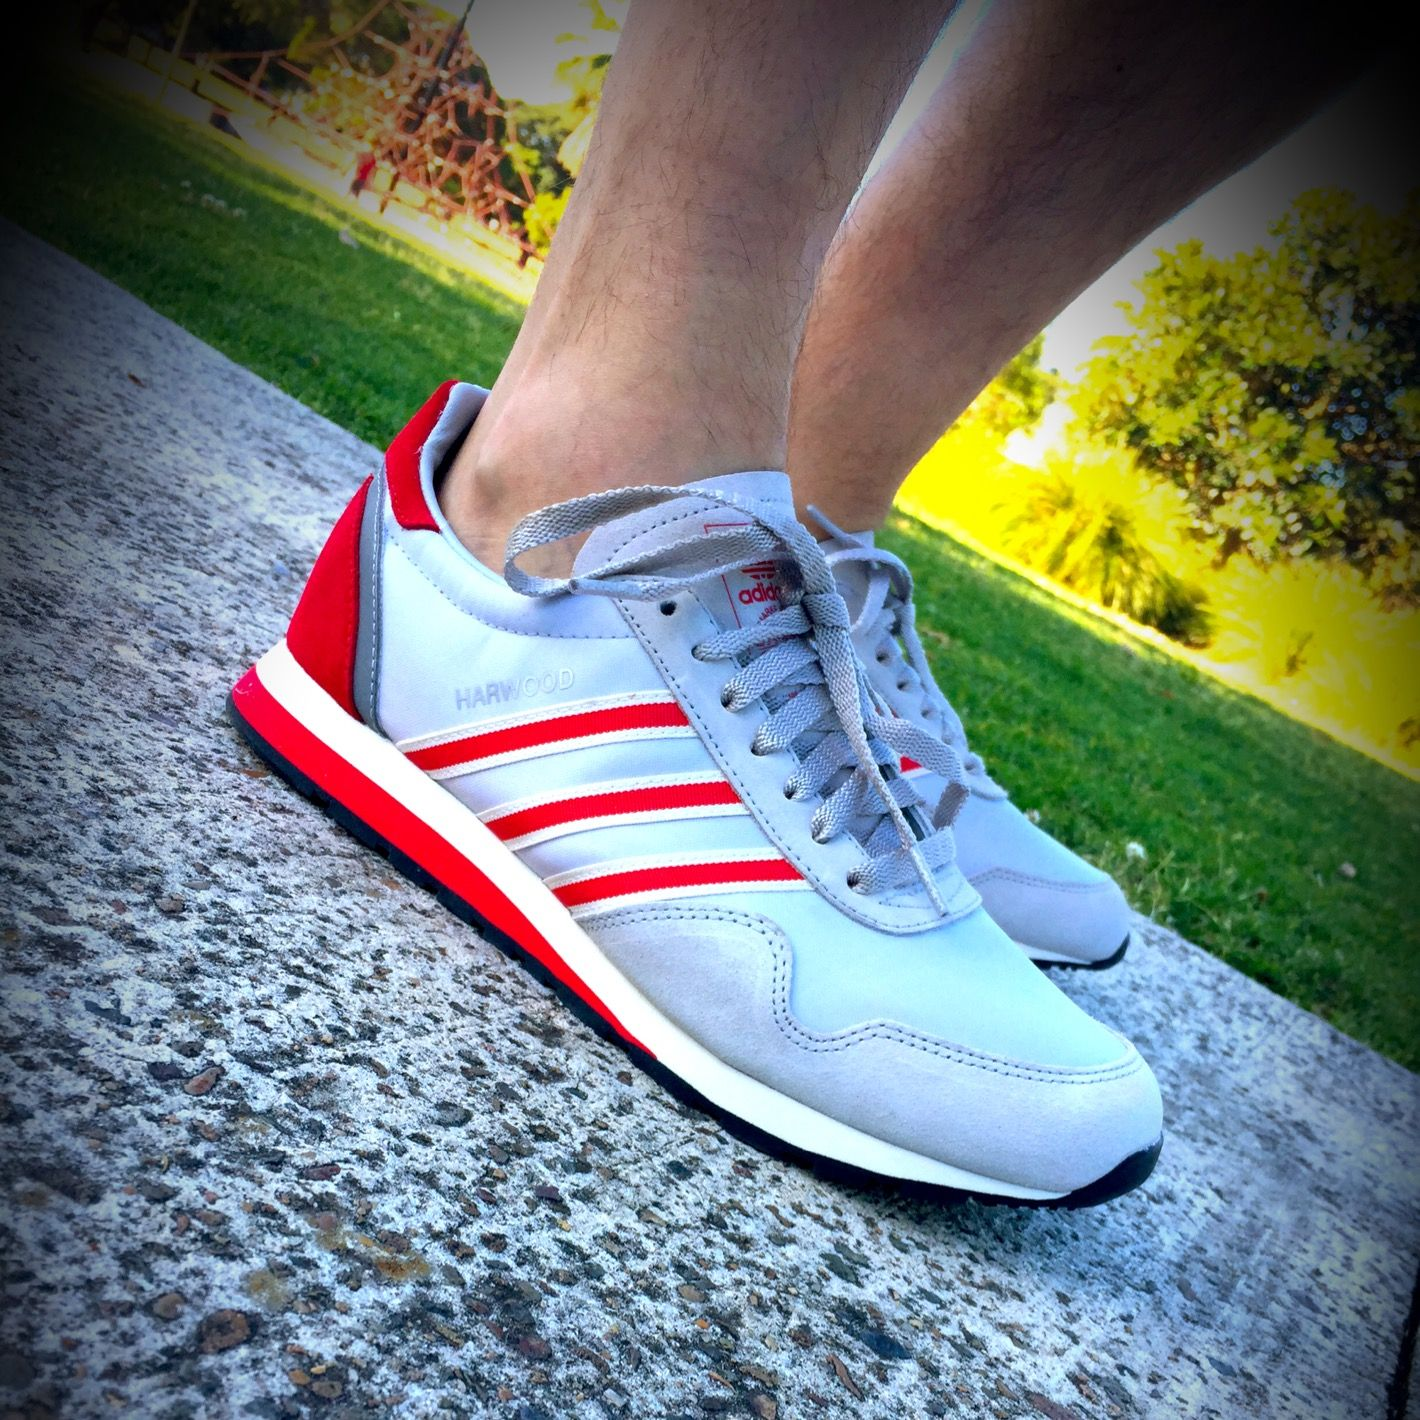 Harwood SPZL | Adidas spezial